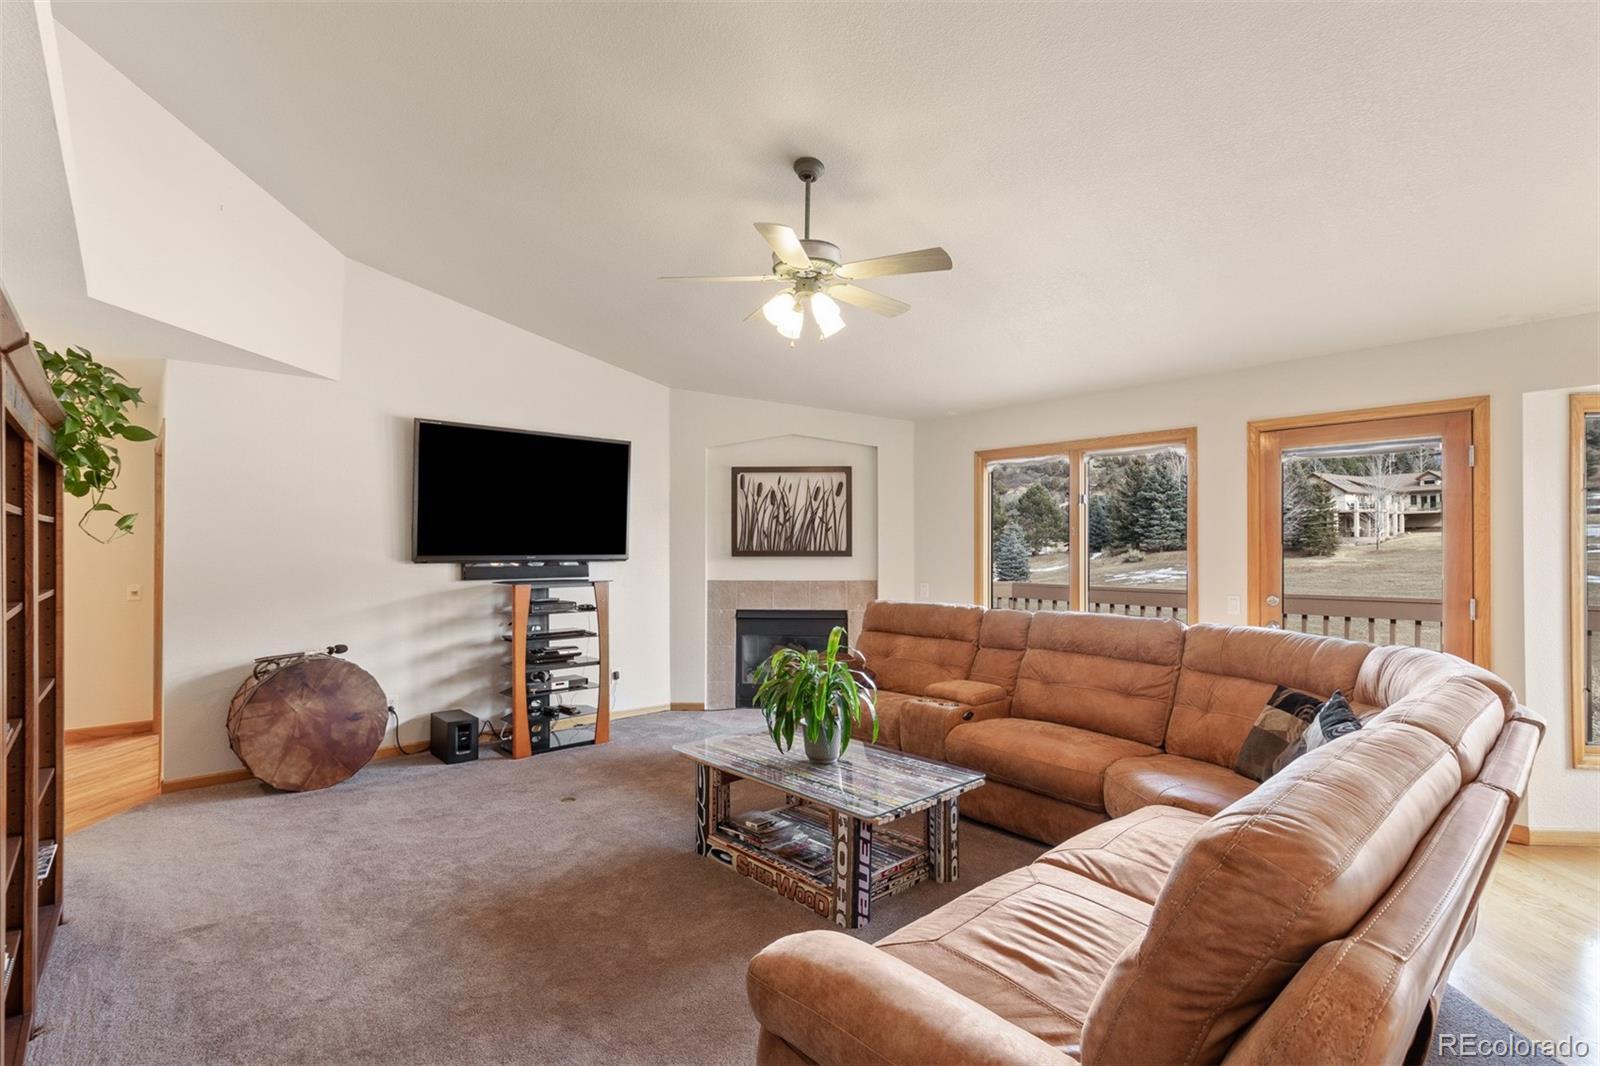 MLS# 4859558 - 6 - 6064 Meadowbrook Drive, Morrison, CO 80465